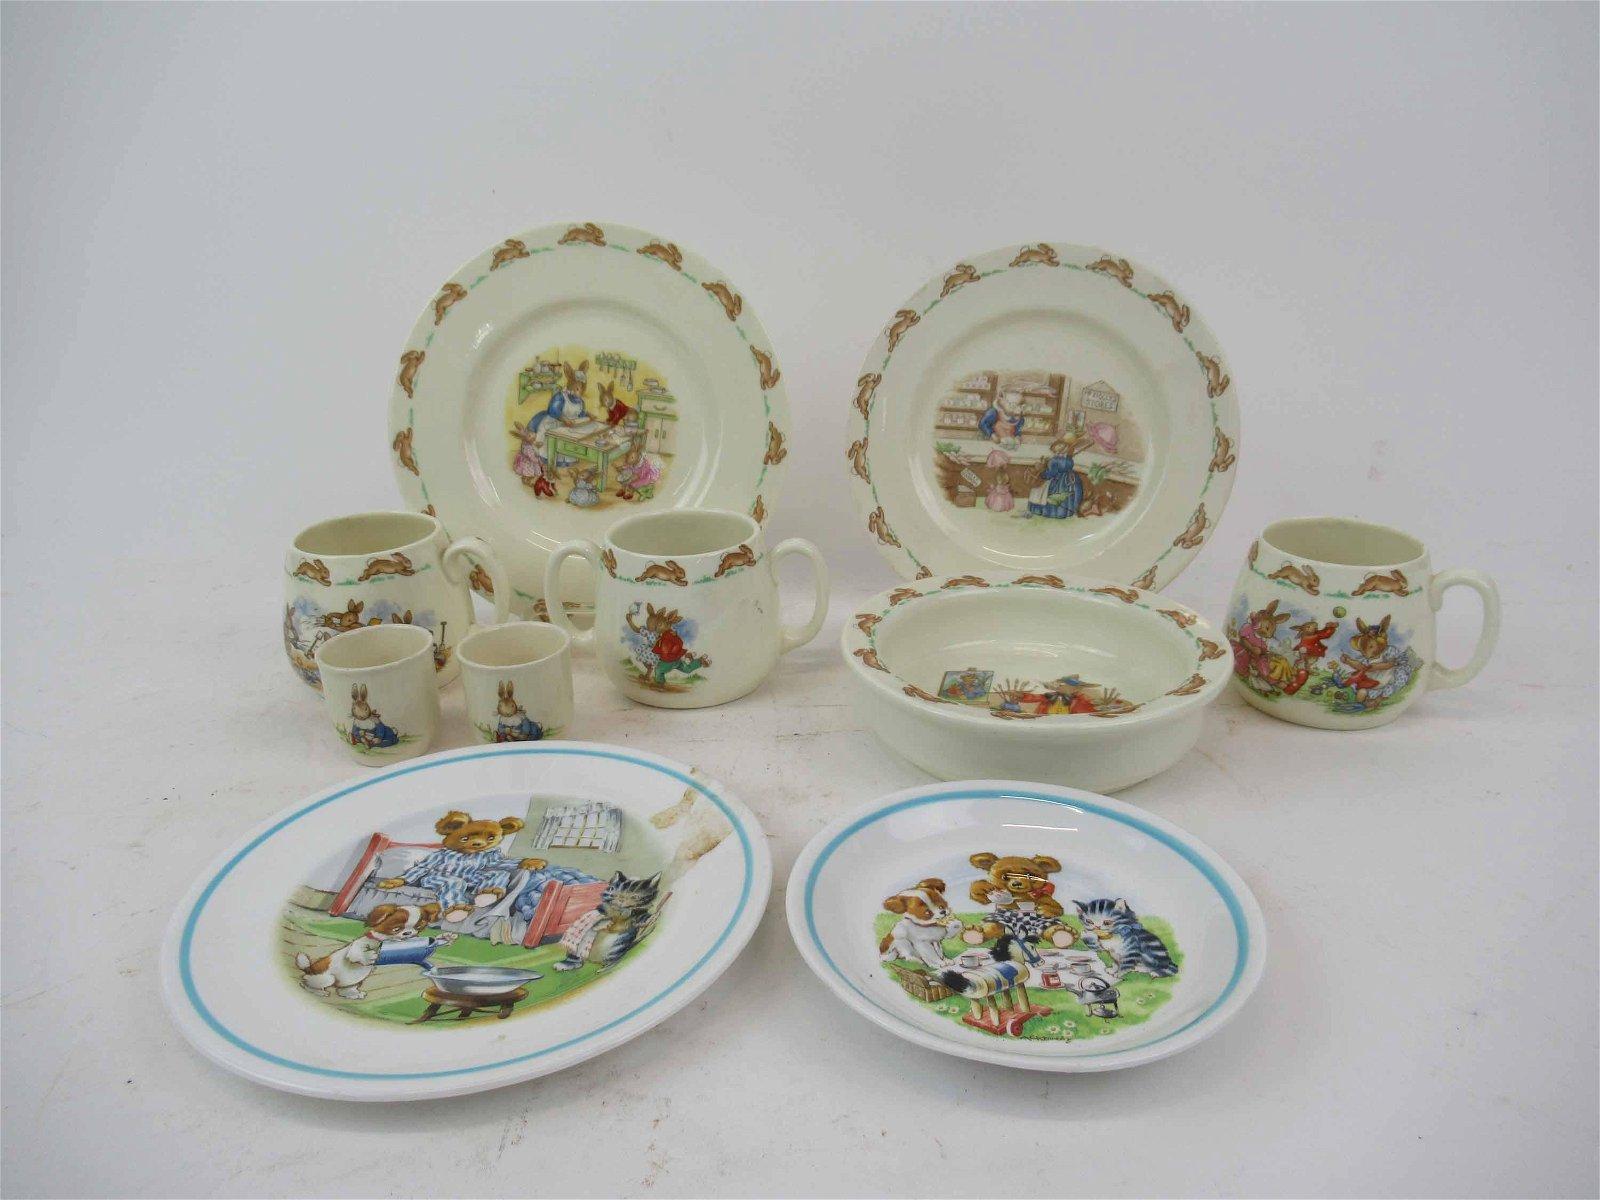 Royal Doulton Bunnykins Cereal Set